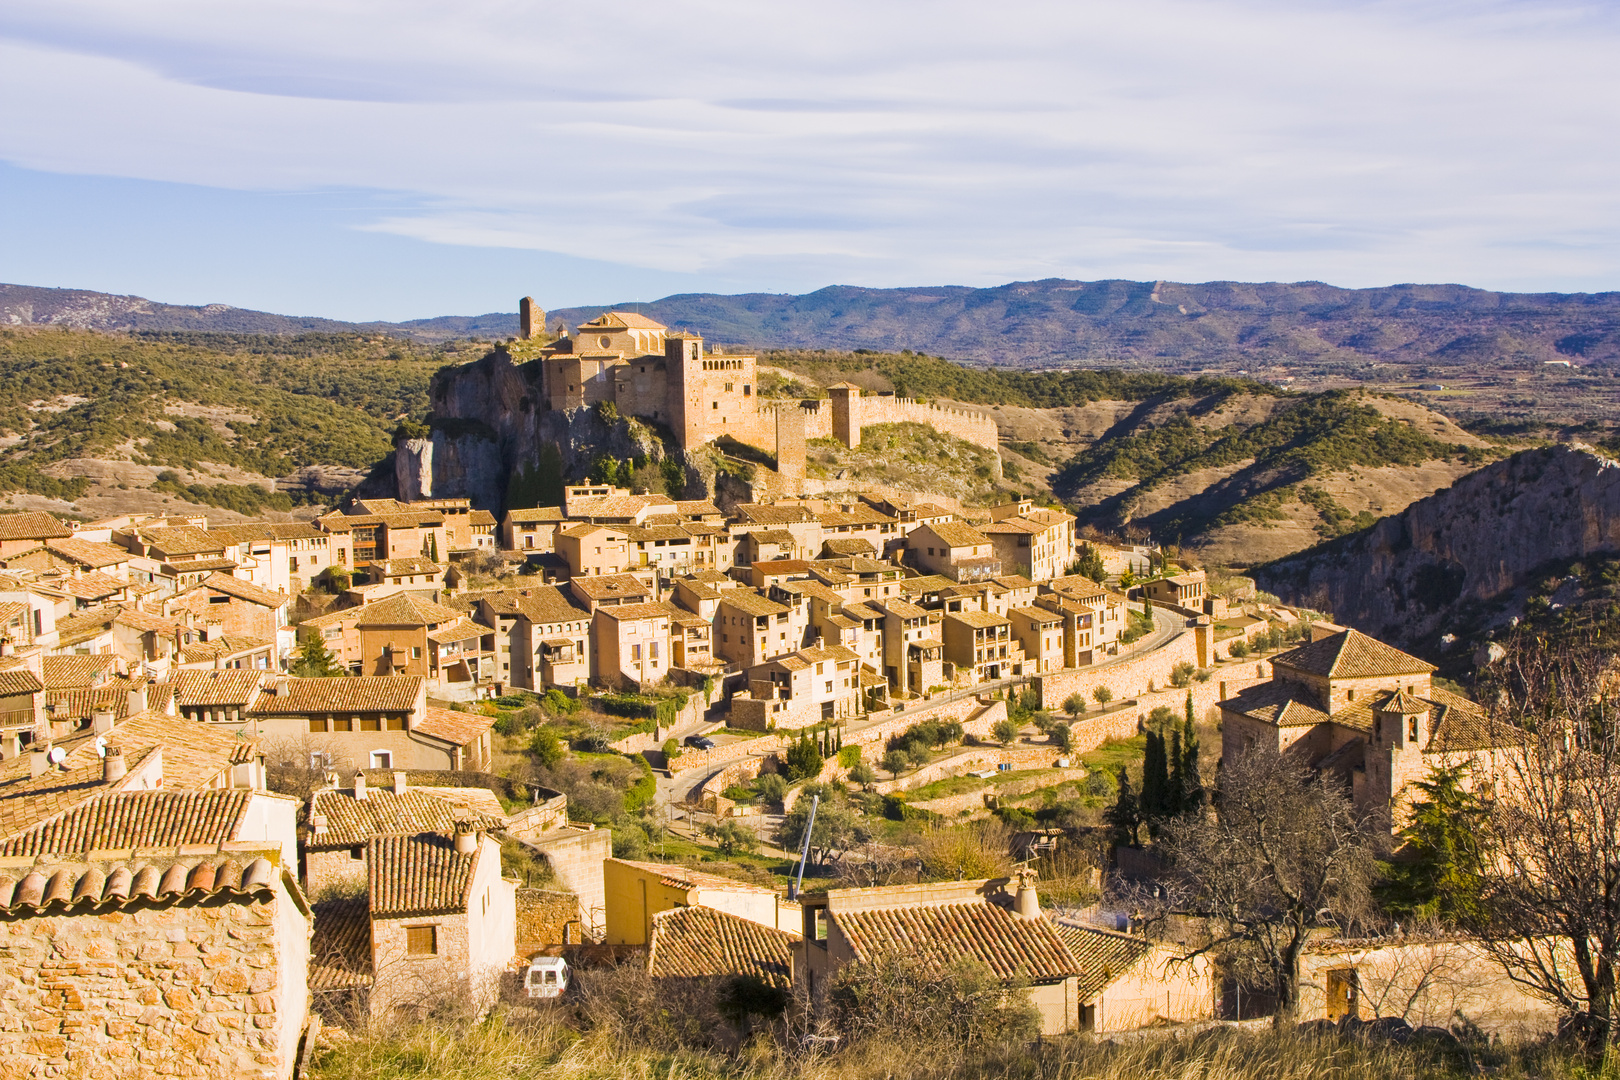 Alquezar (Huesca) 1